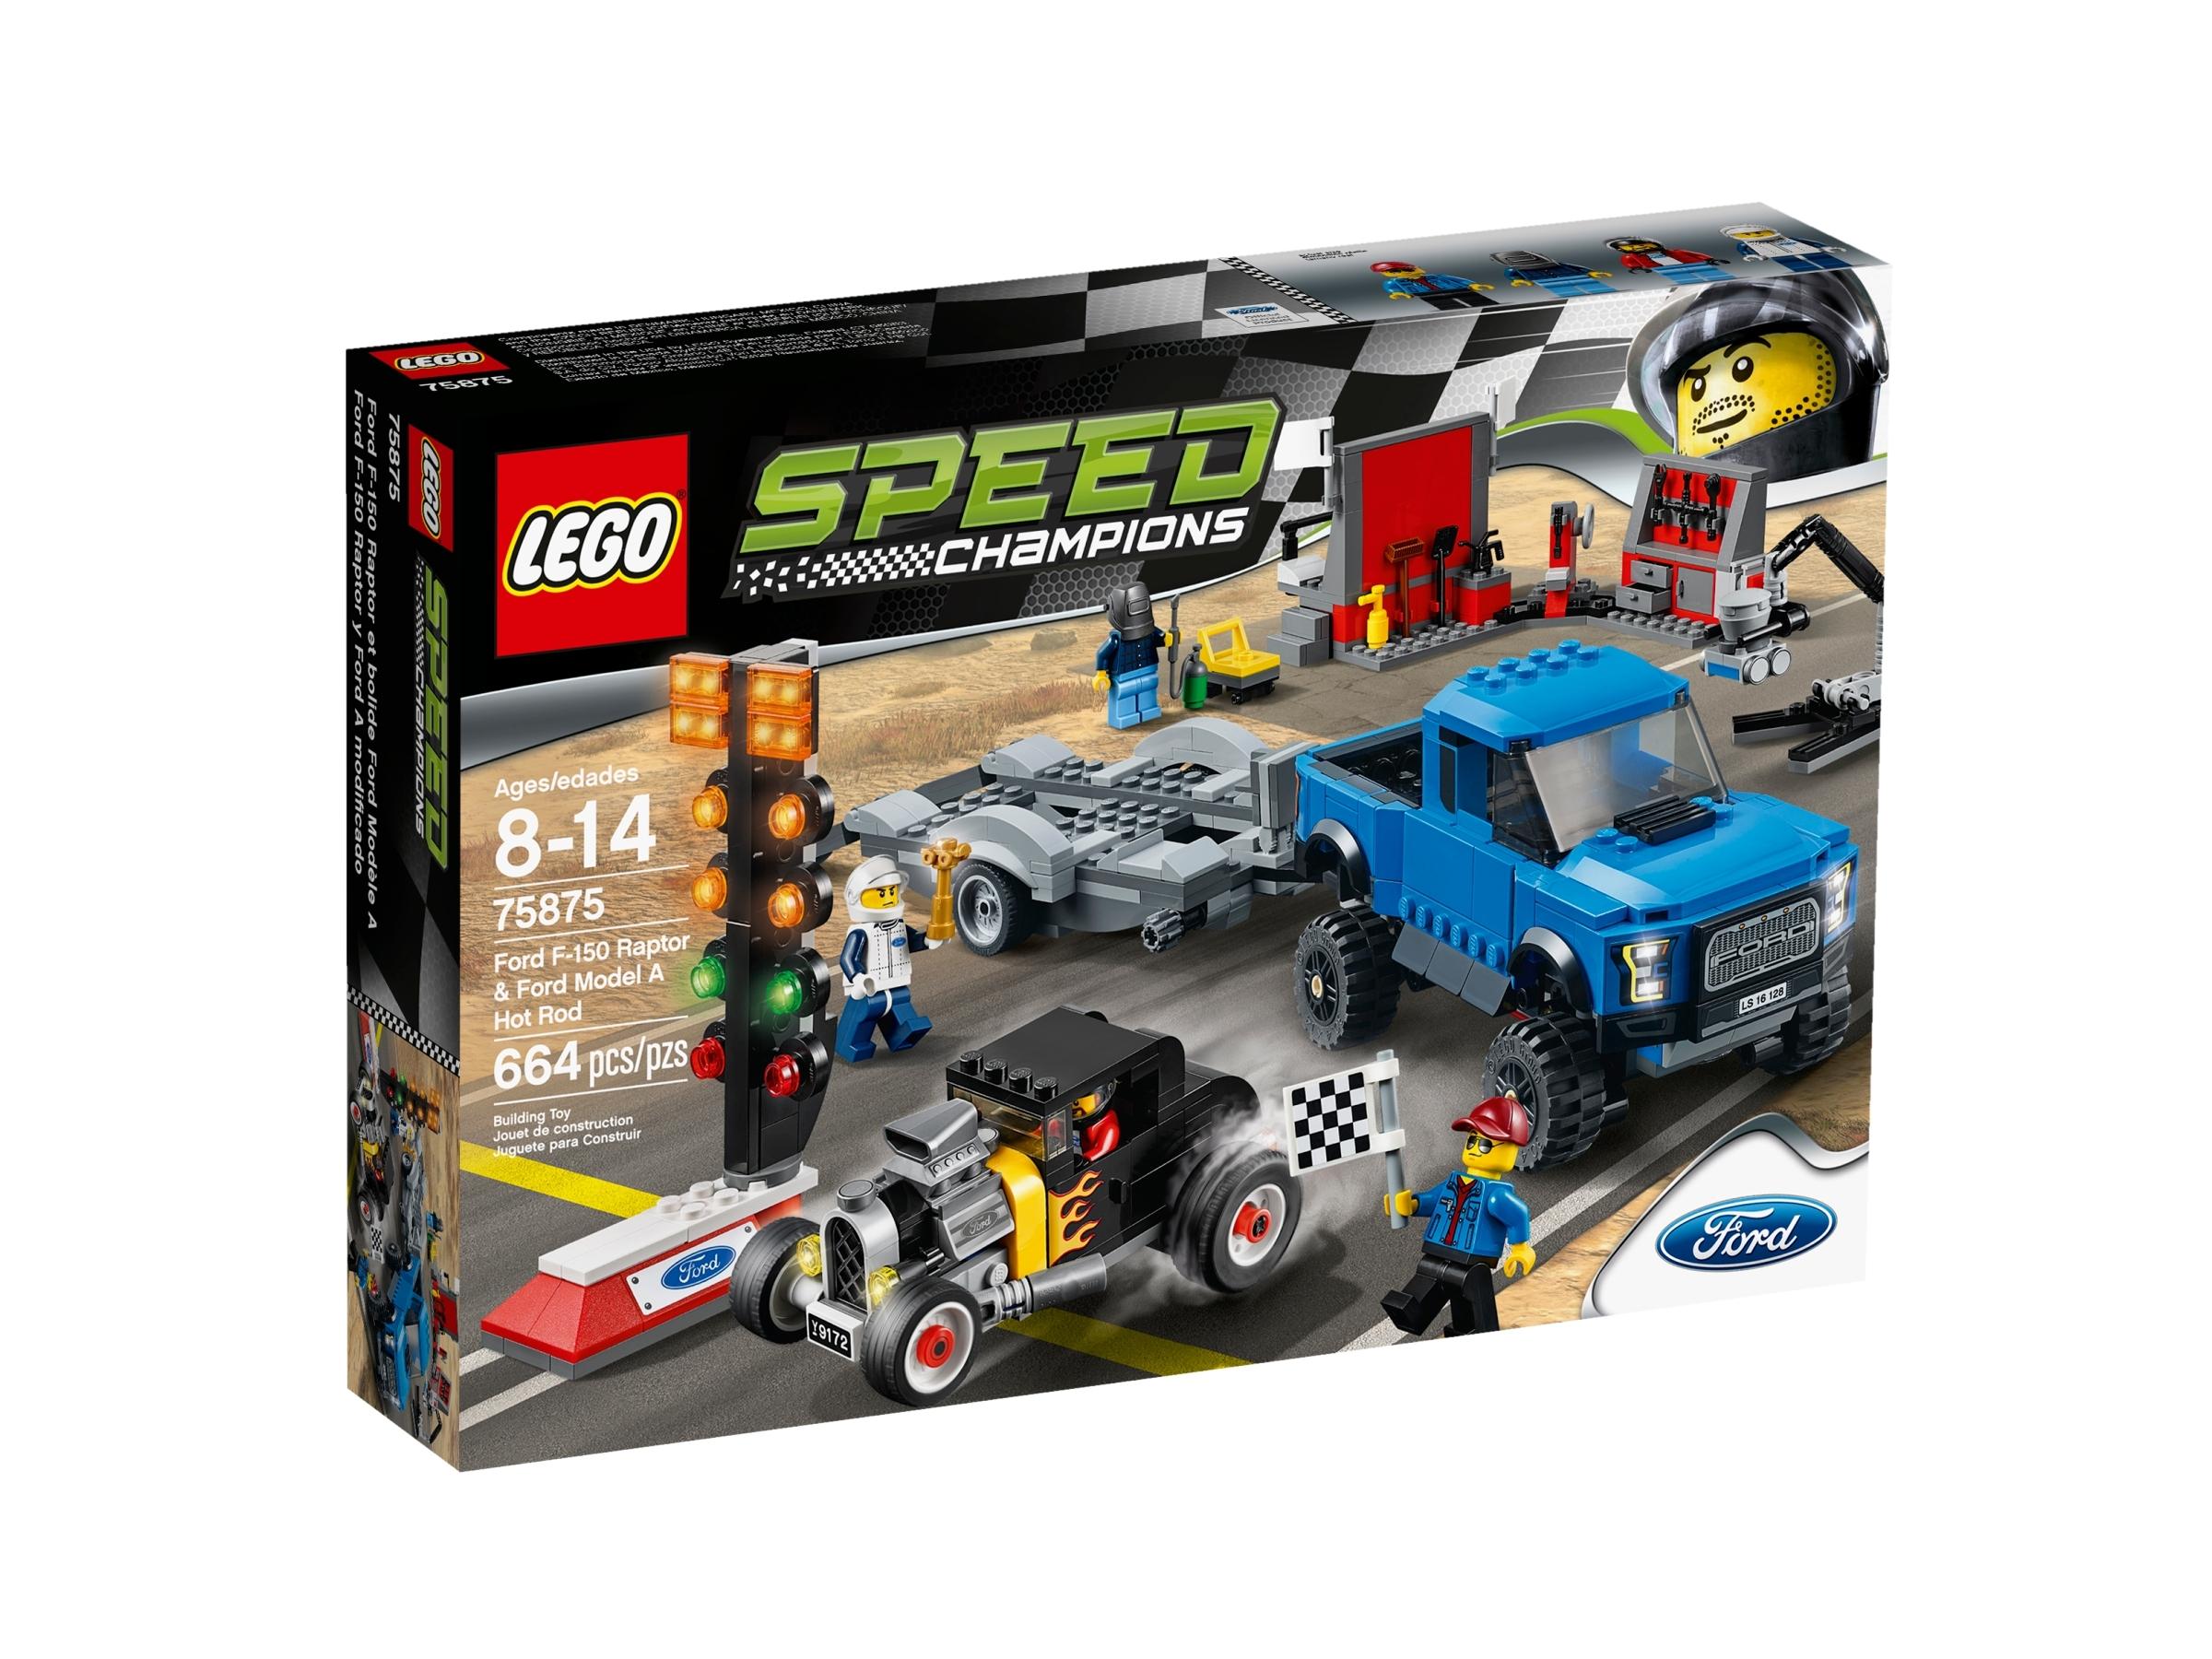 lego 75875 ford f 150 raptor ja fordin a mallin viritetty auto